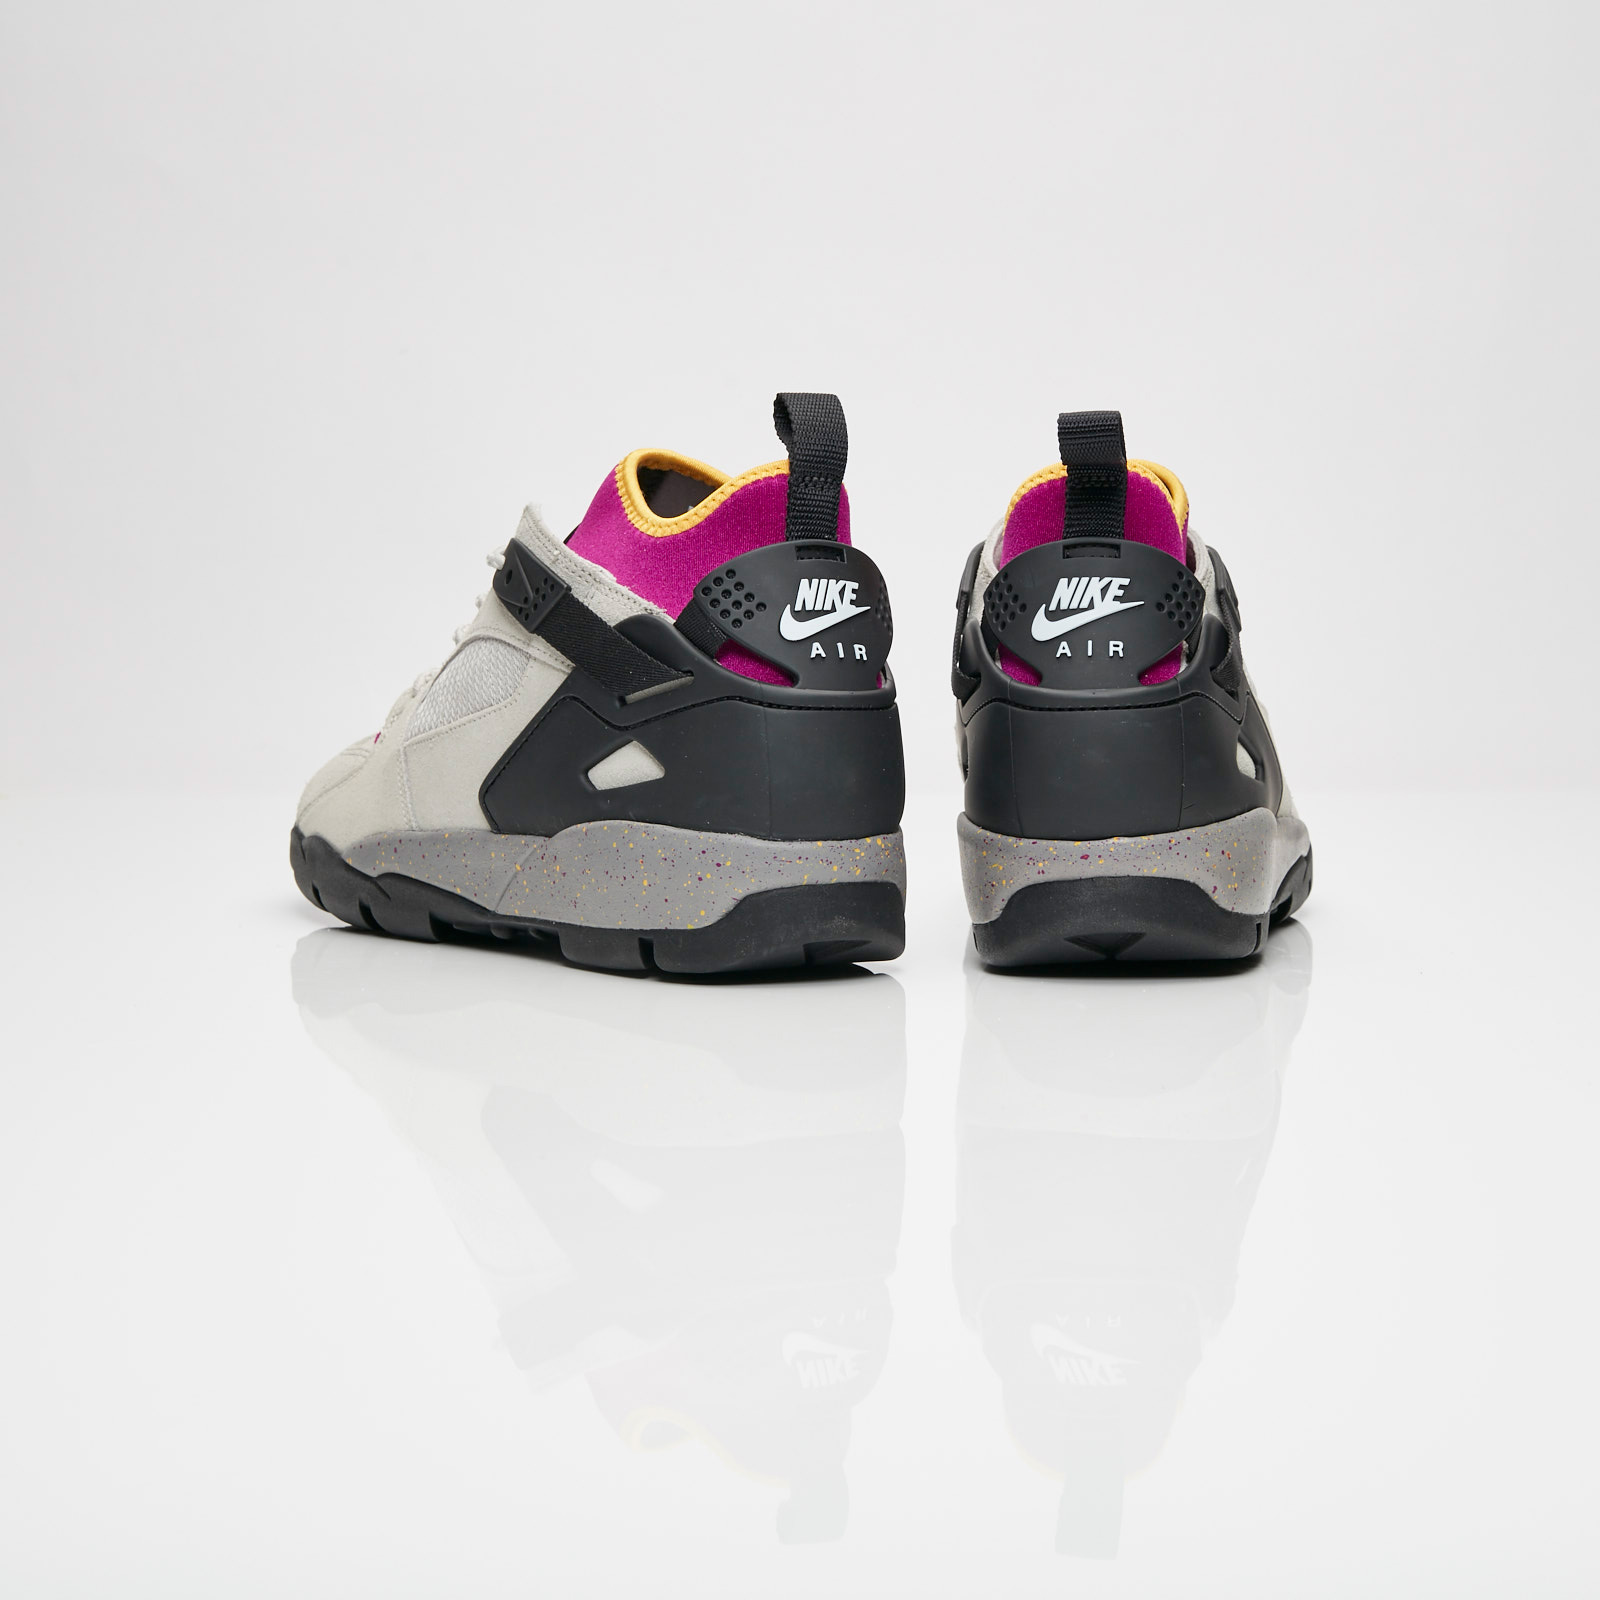 the latest c1c9c f76d5 Nike Air Revaderchi - Ar0479-001 - Sneakersnstuff   sneakers   streetwear  online since 1999